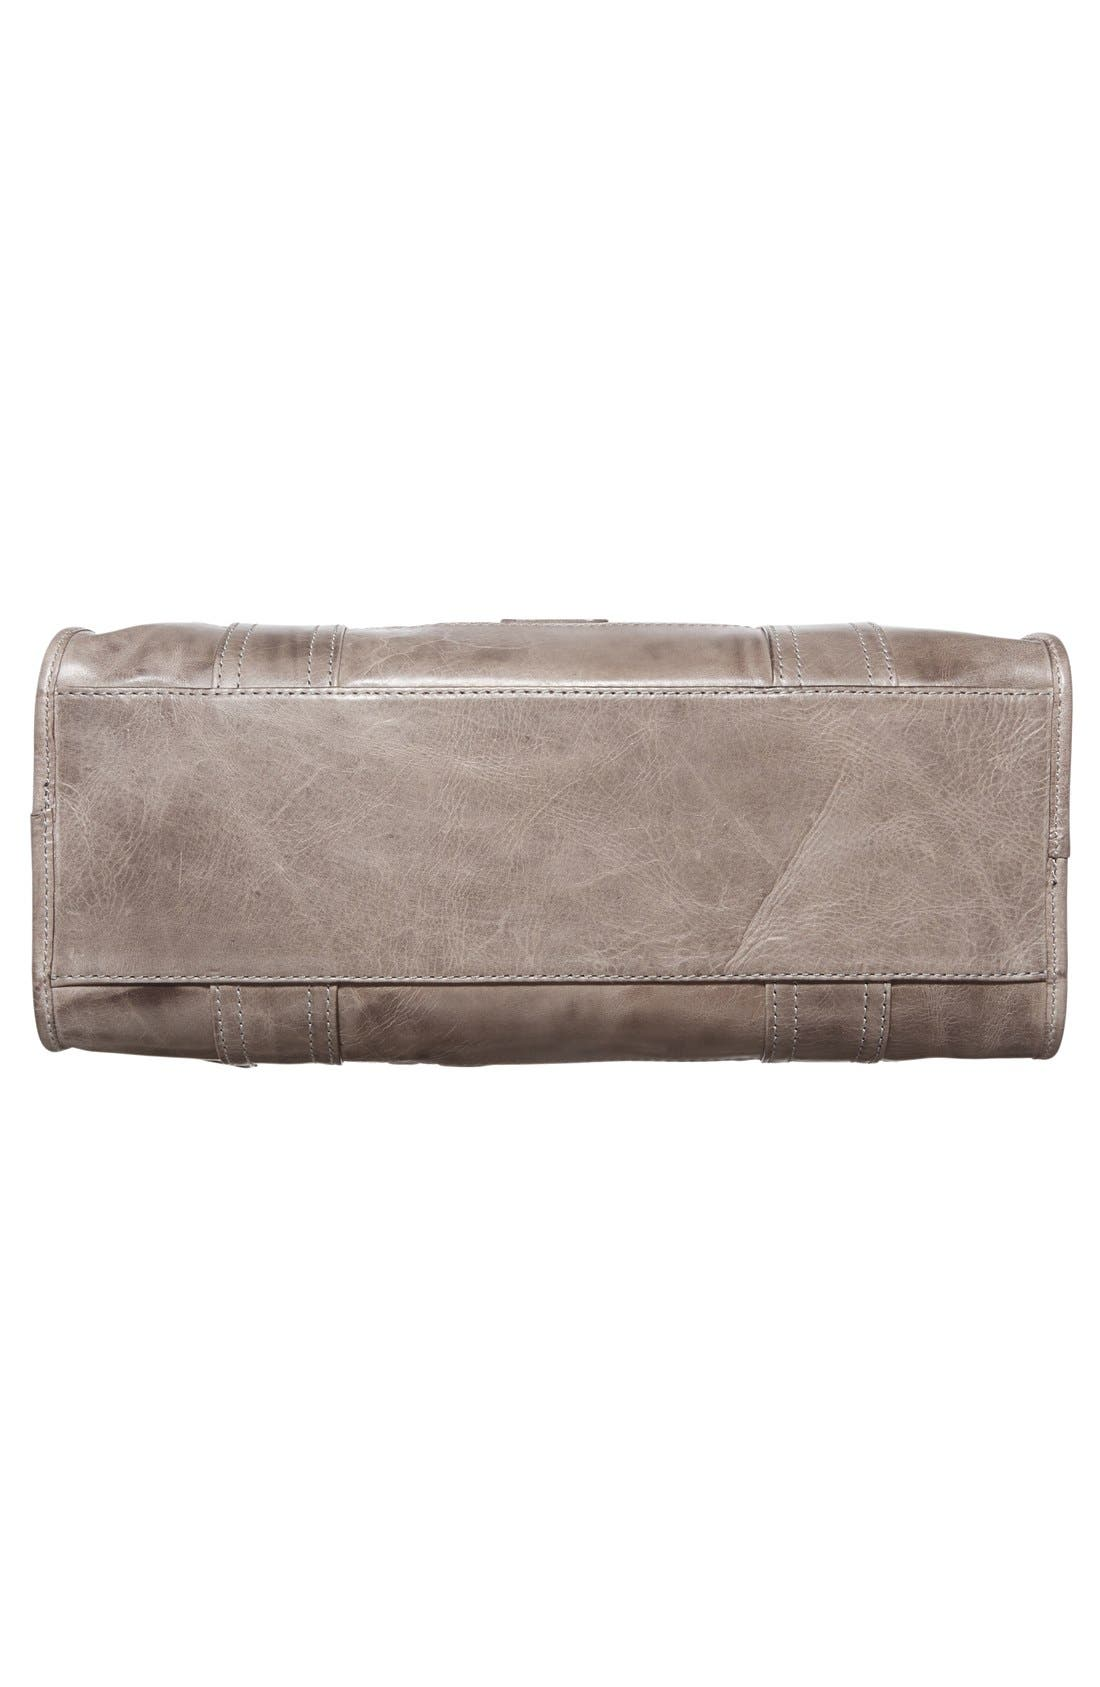 FRYE,                             'Melissa' Washed Leather Satchel,                             Alternate thumbnail 12, color,                             ICE